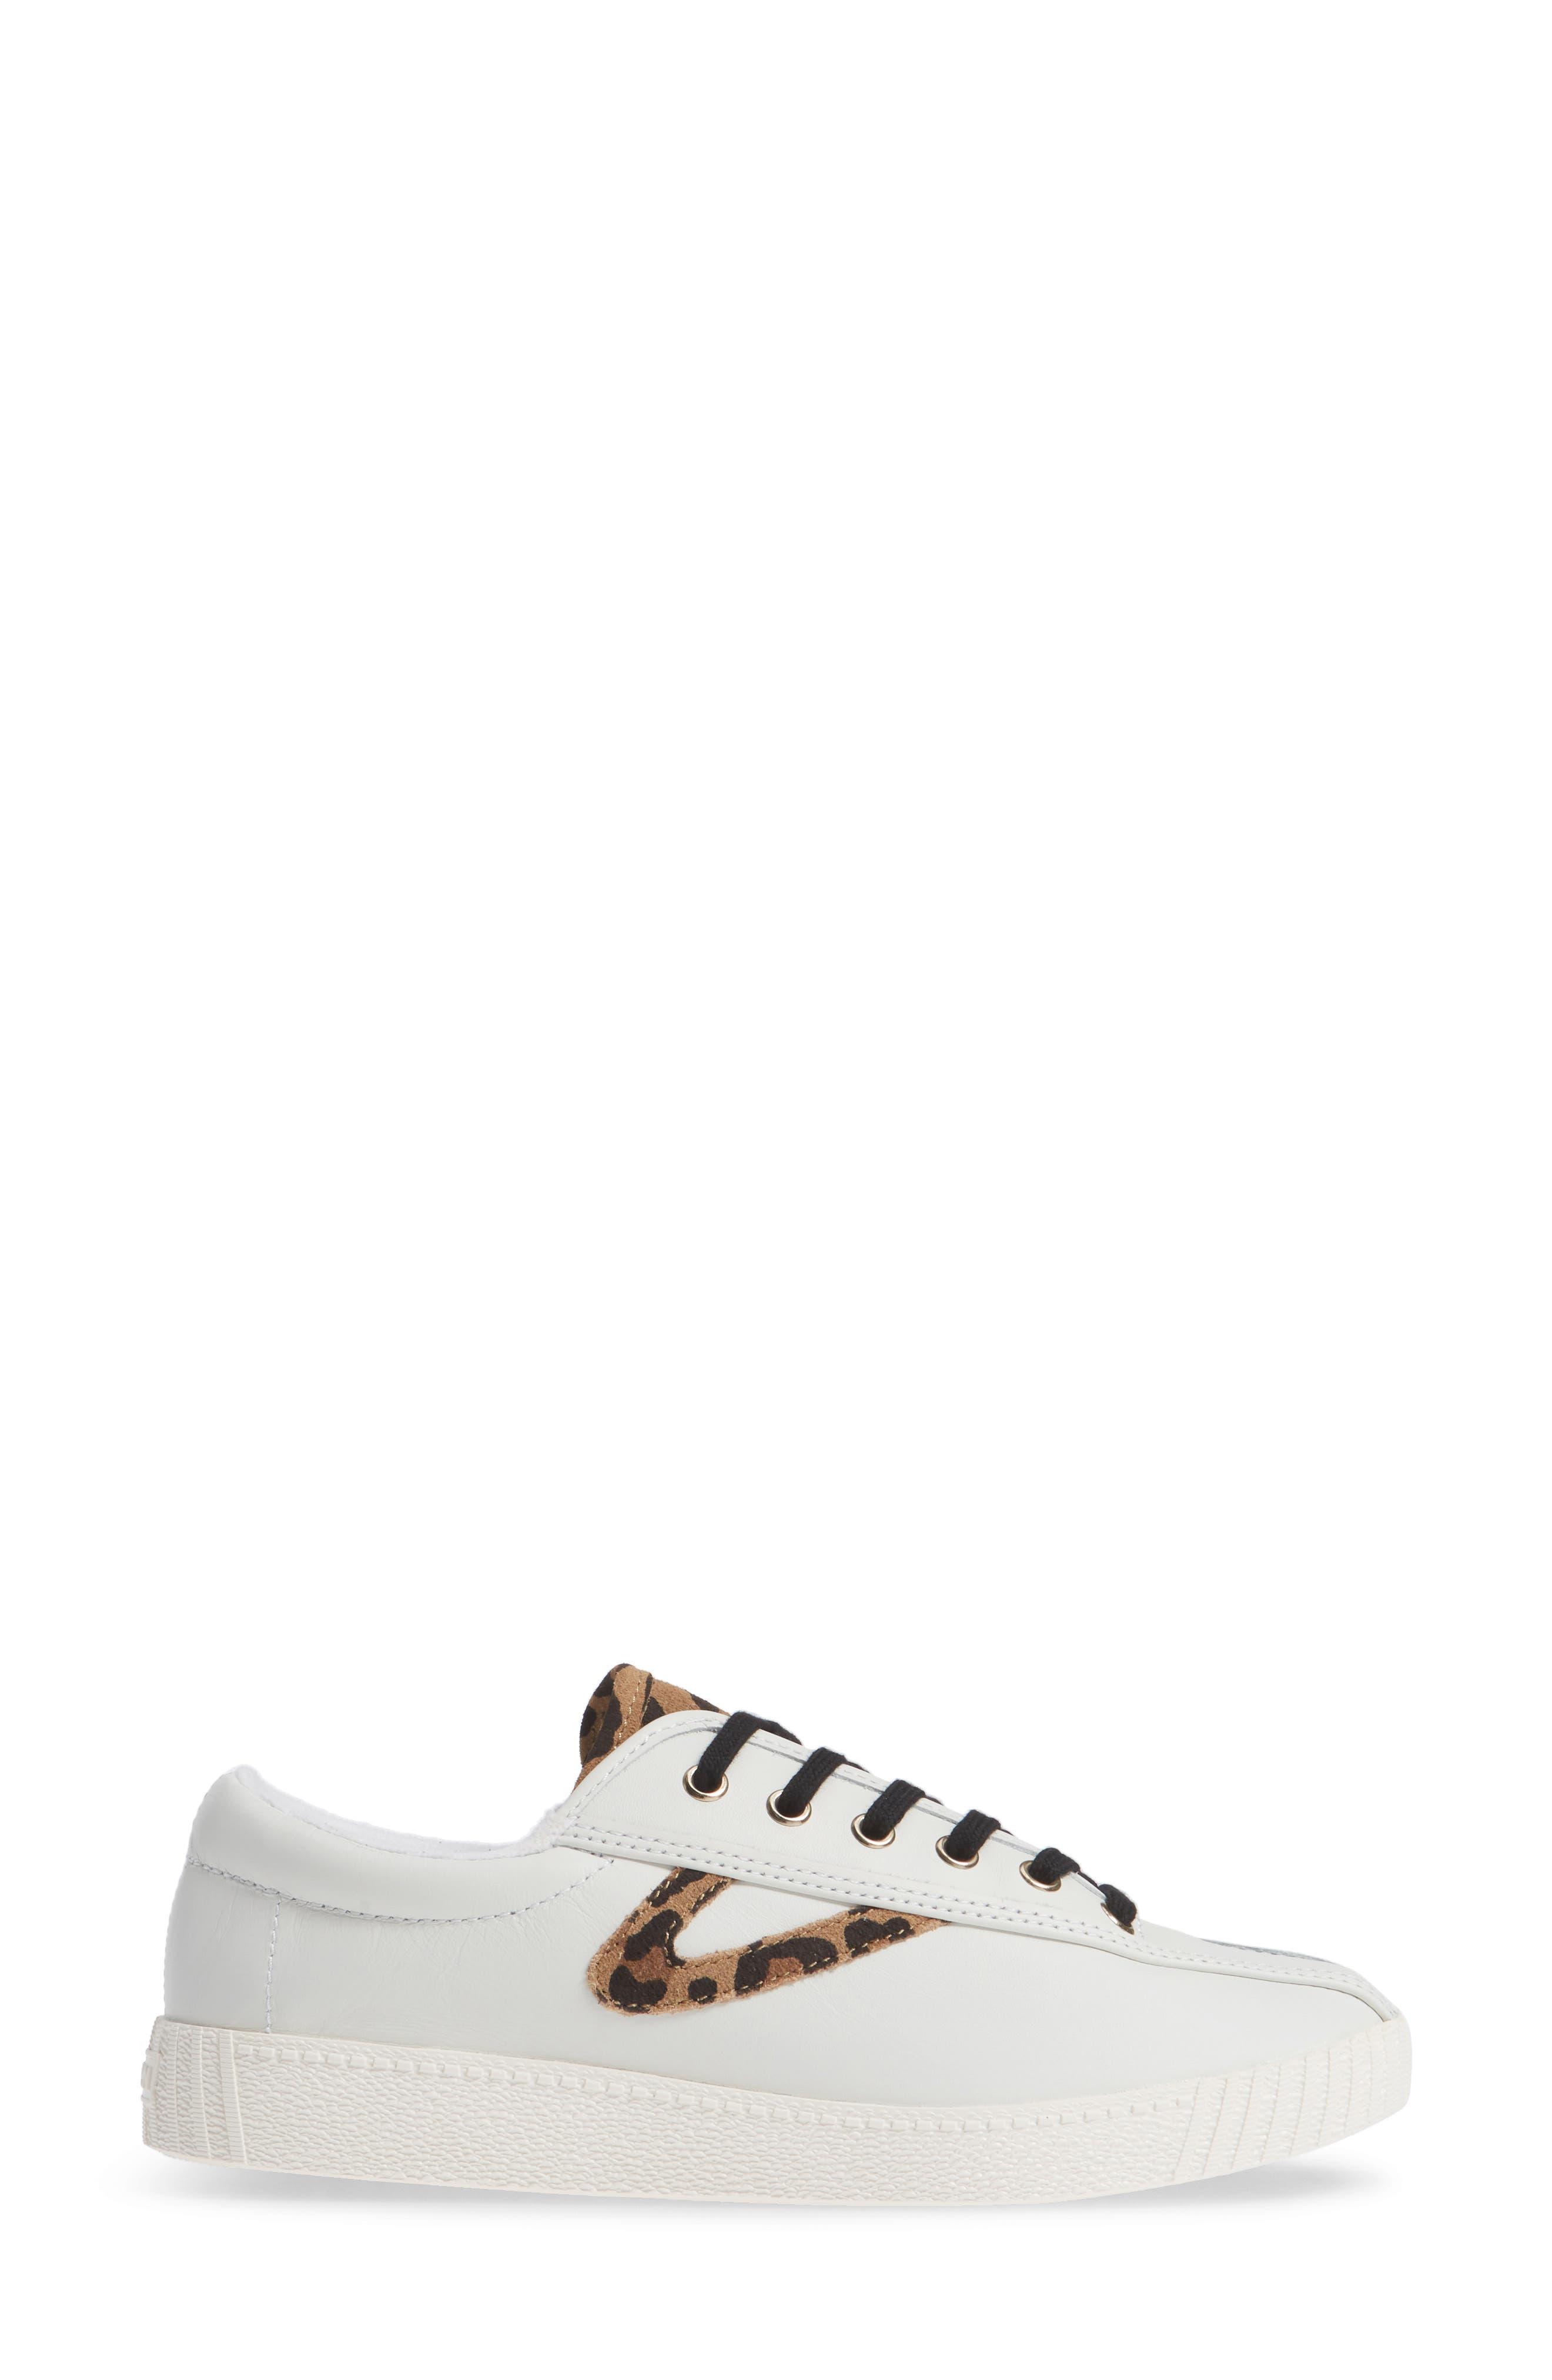 Patterned Sneaker,                             Alternate thumbnail 5, color,                             Vintage White/ Tan Multi